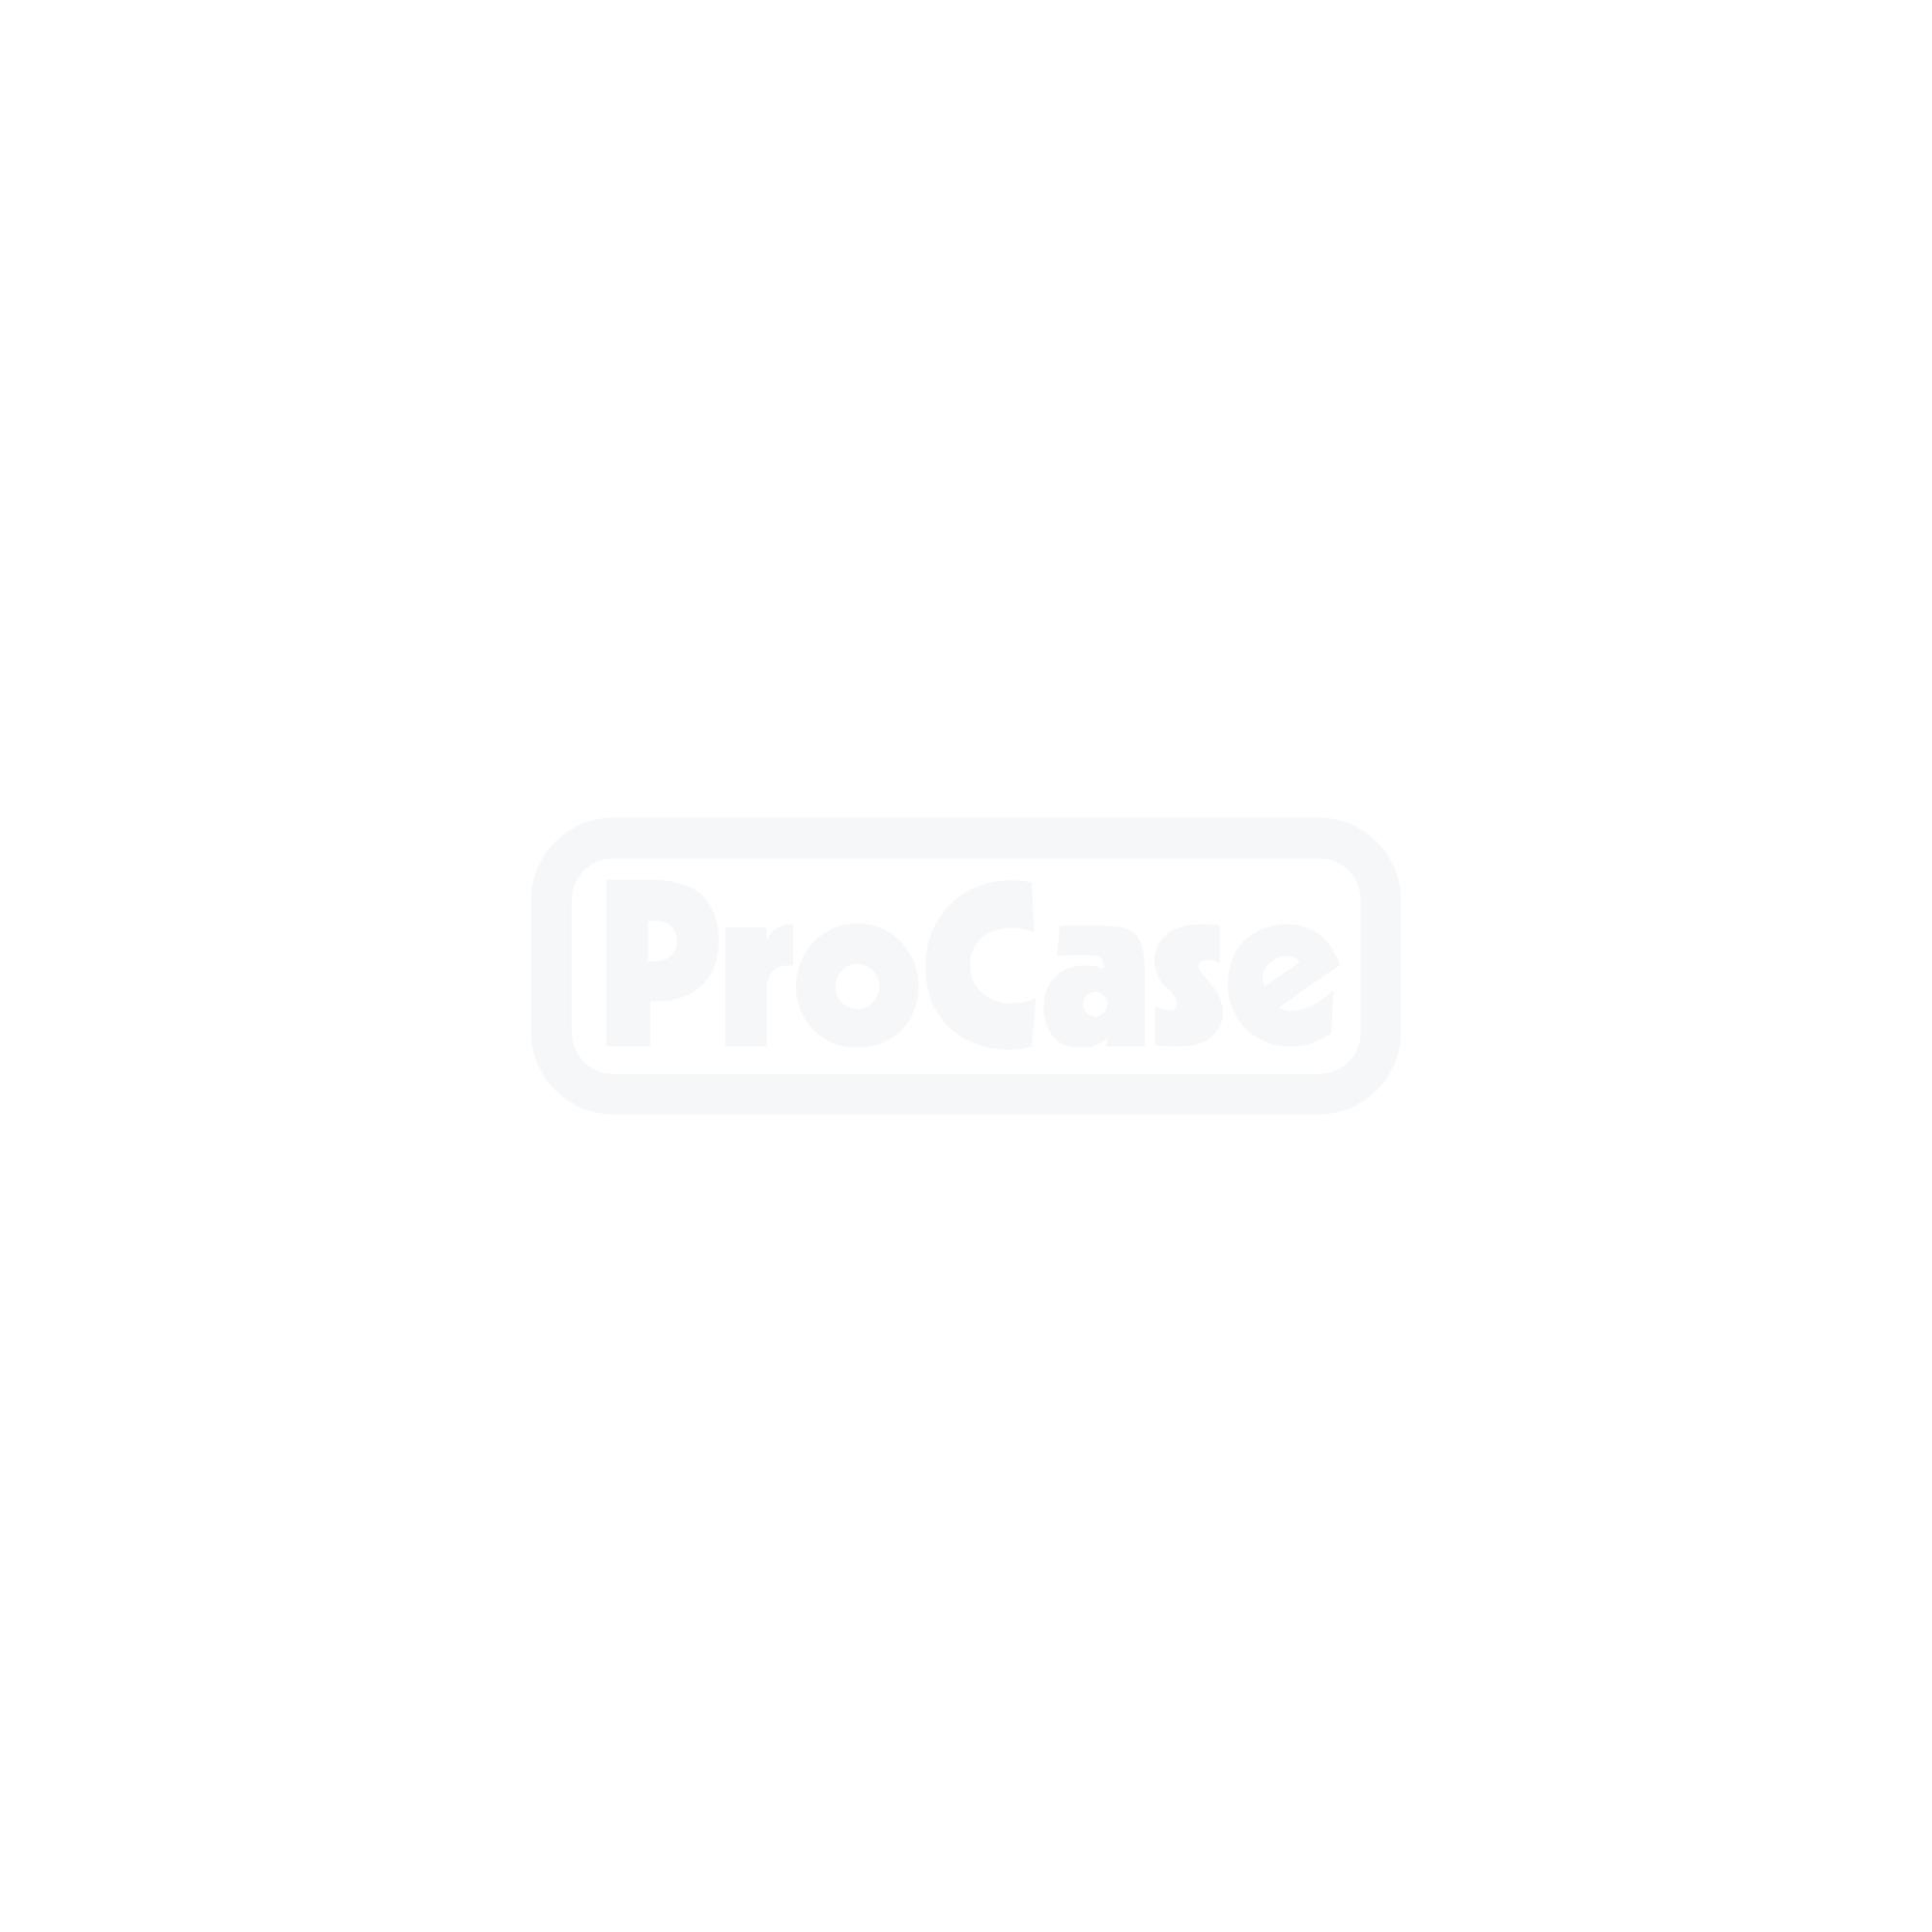 SKB 3i Koffer 1711-6B mit Rasterschaumstoff